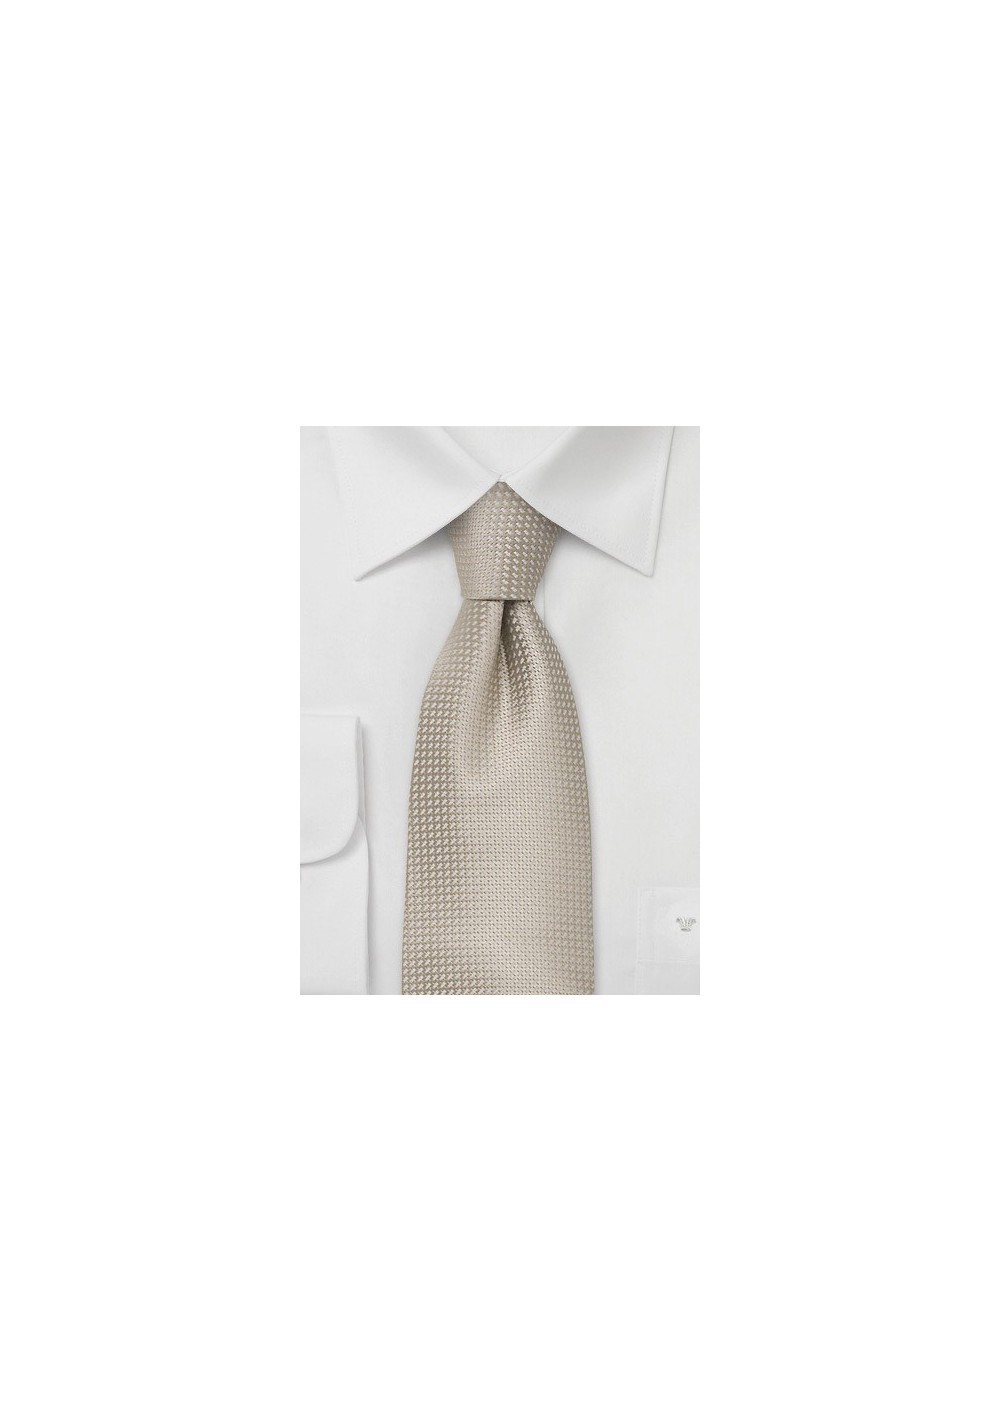 Elegant Summer Tie in Wheat-Tan Color